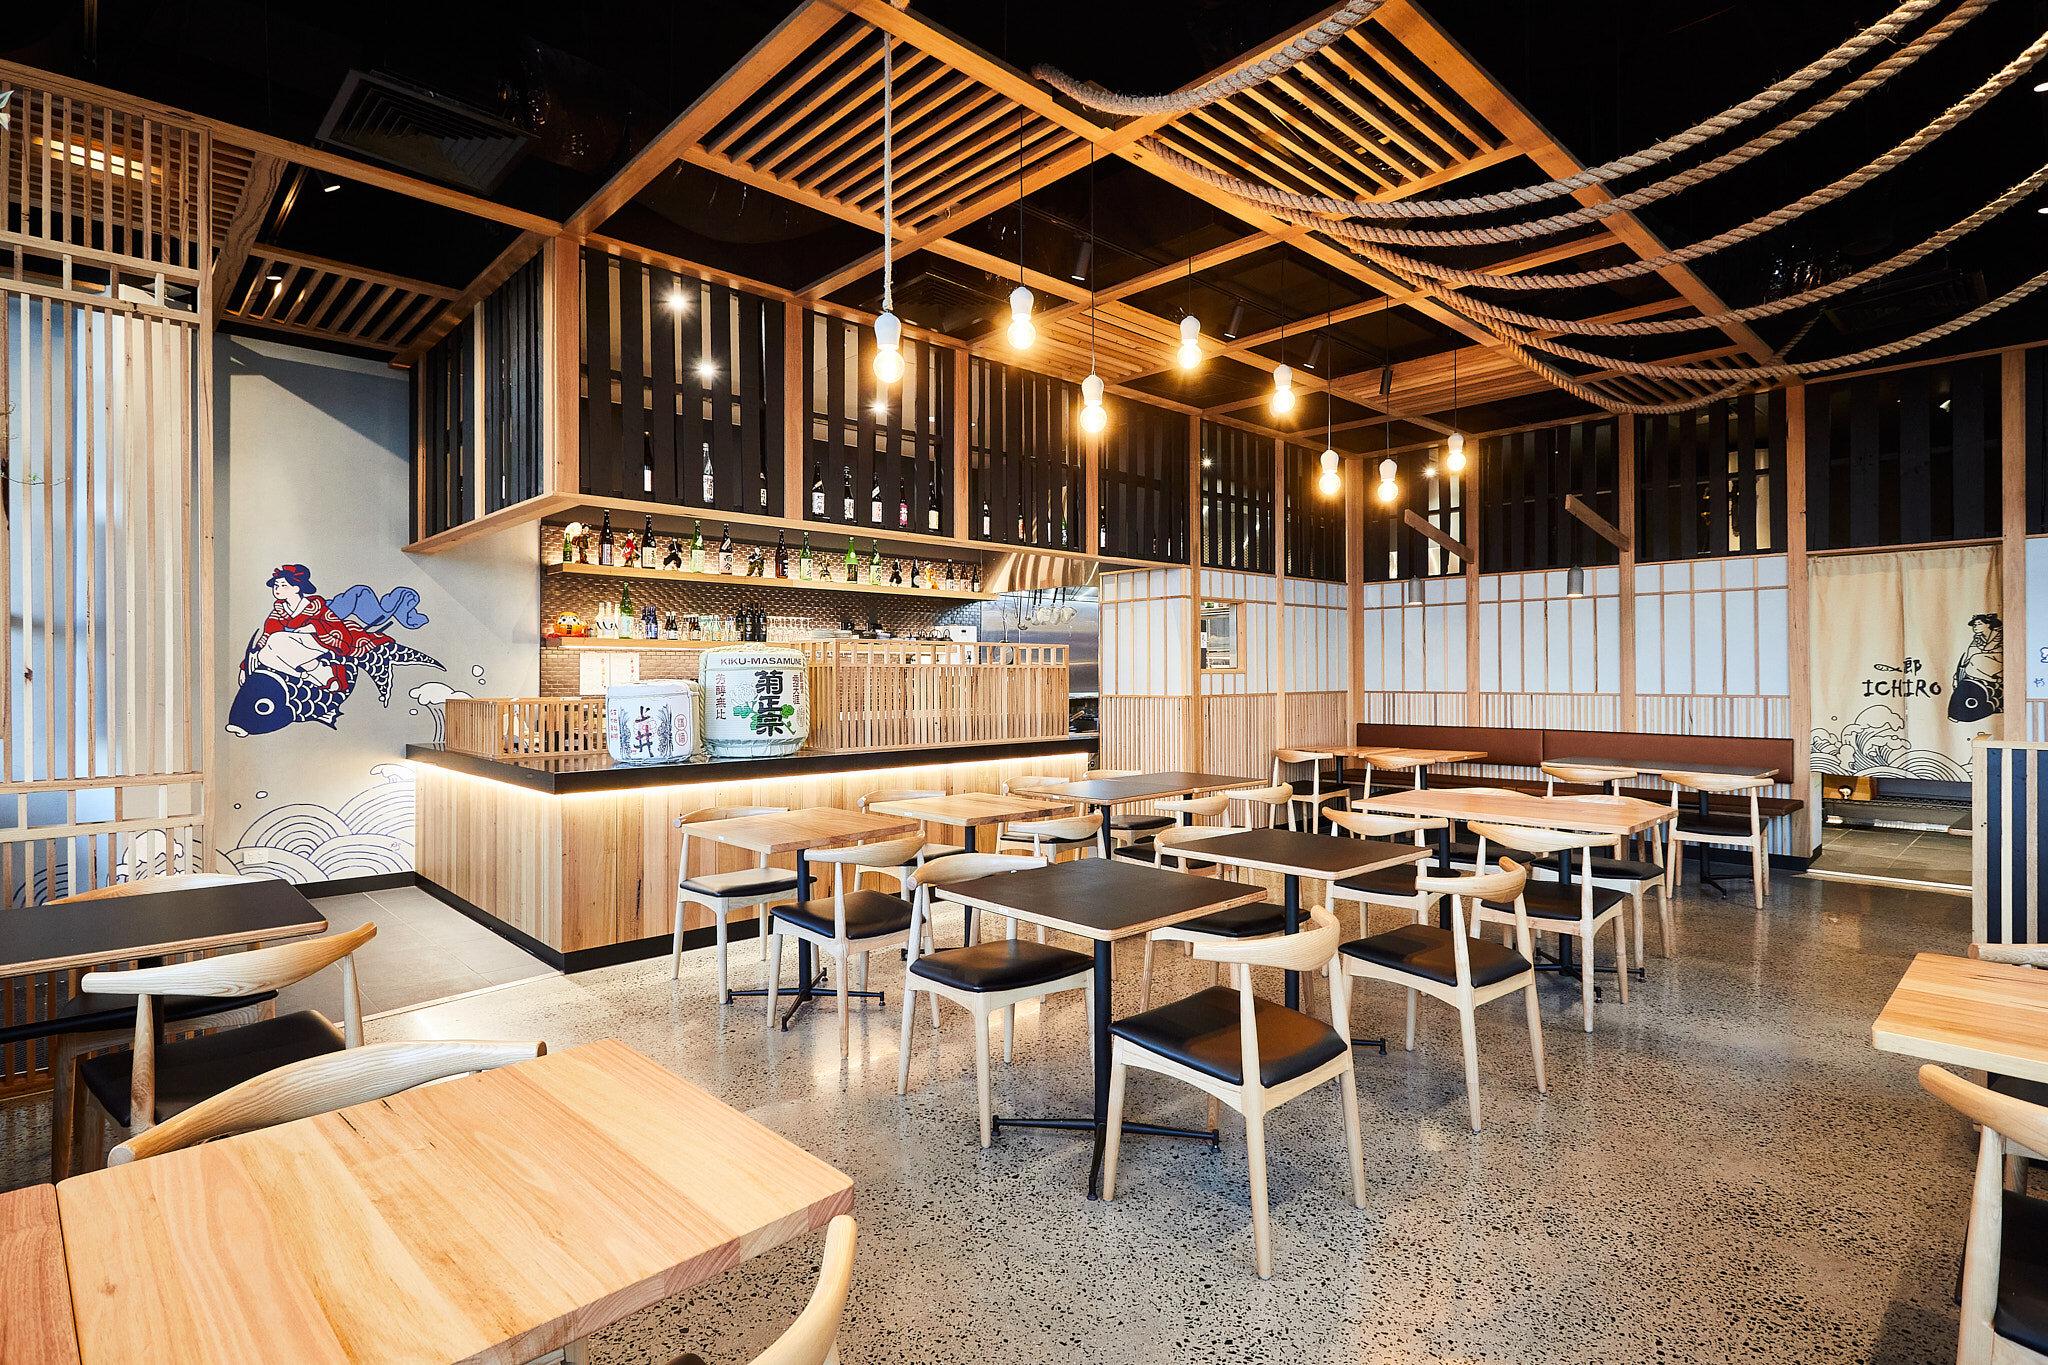 Studio Grayscale Retail Hospitality Interior Design